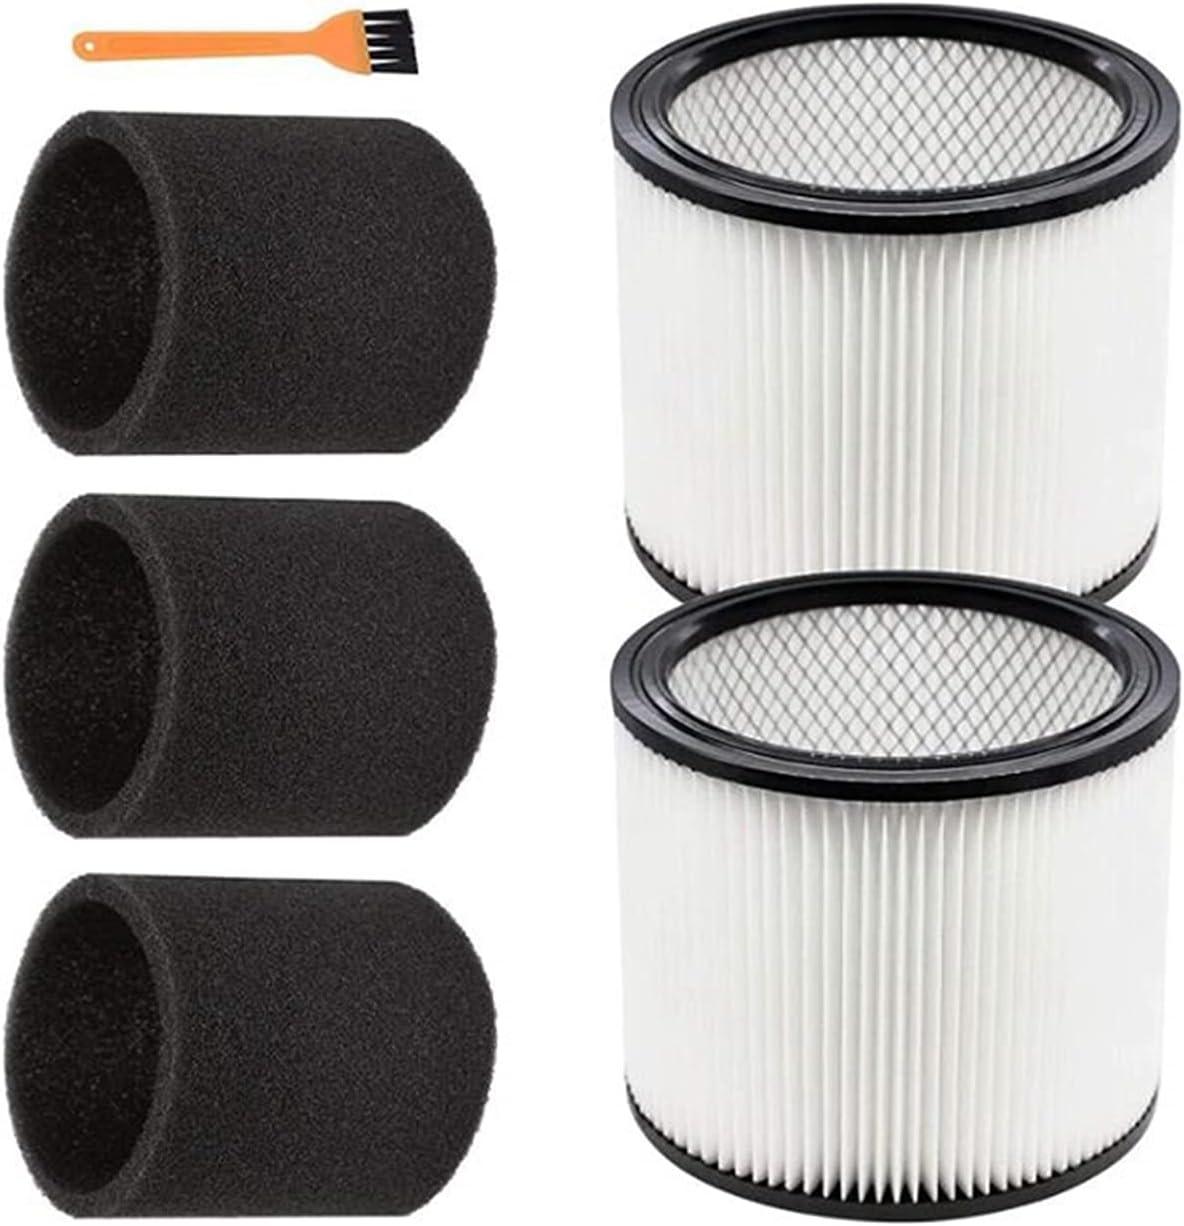 SHUOGUO 6 Pcs Foam Sleeve 5 ☆ popular half Filter for Vac 90304 Fit Shop 9030400